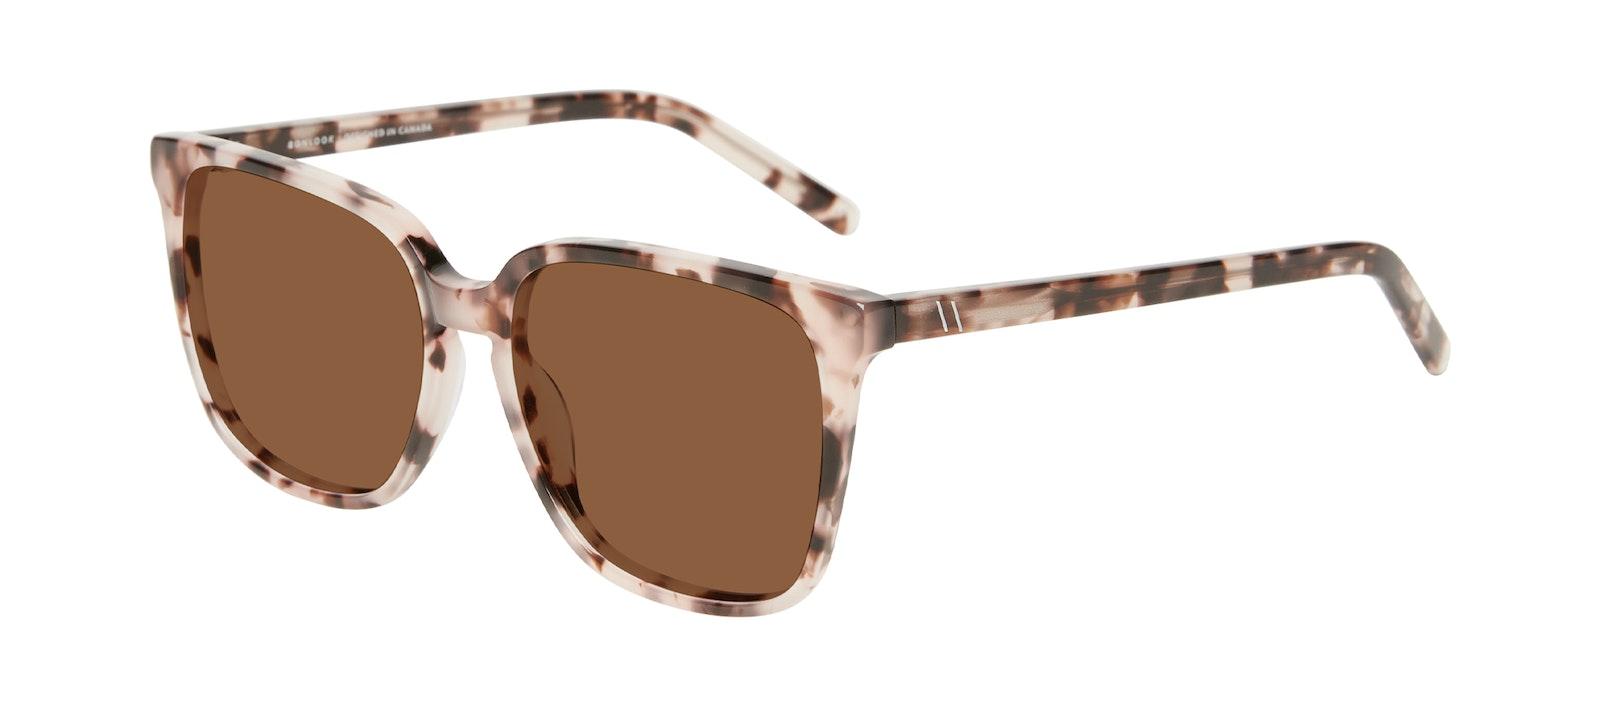 Affordable Fashion Glasses Square Sunglasses Women Runway L Marbled Pink Tilt